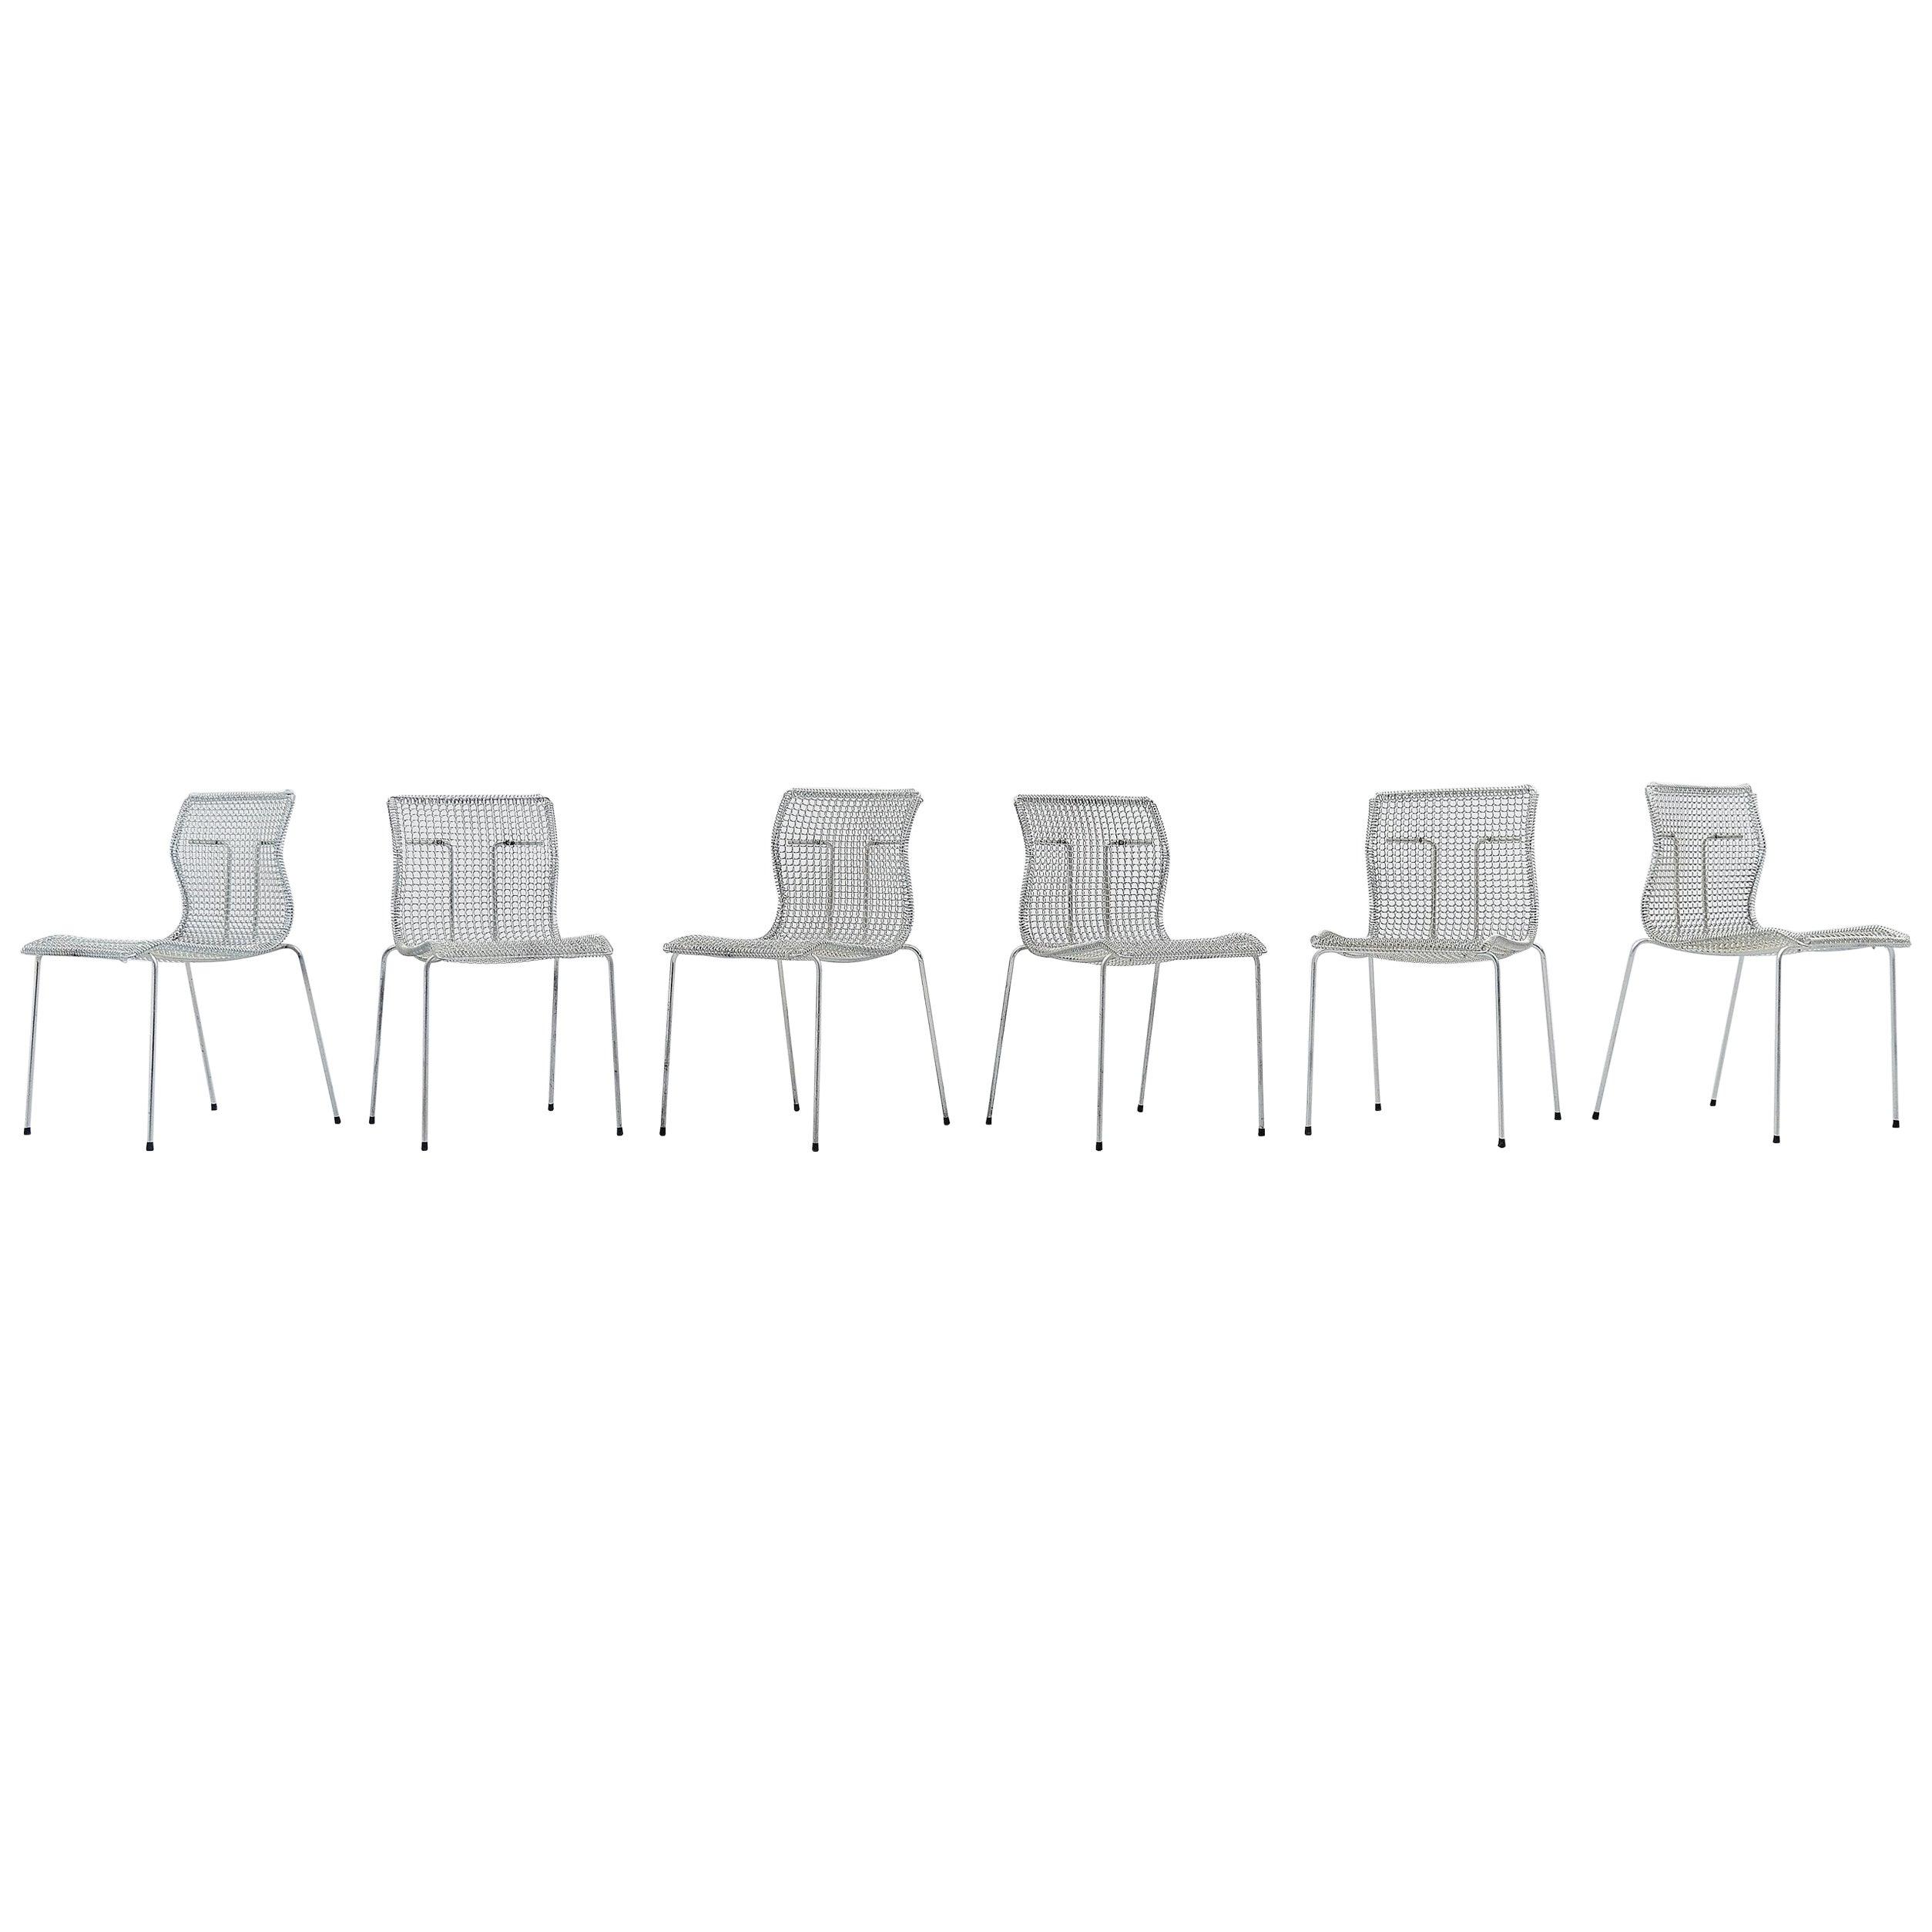 50 Niall O'Flynn Rascal Chairs 't Spectrum, 1997